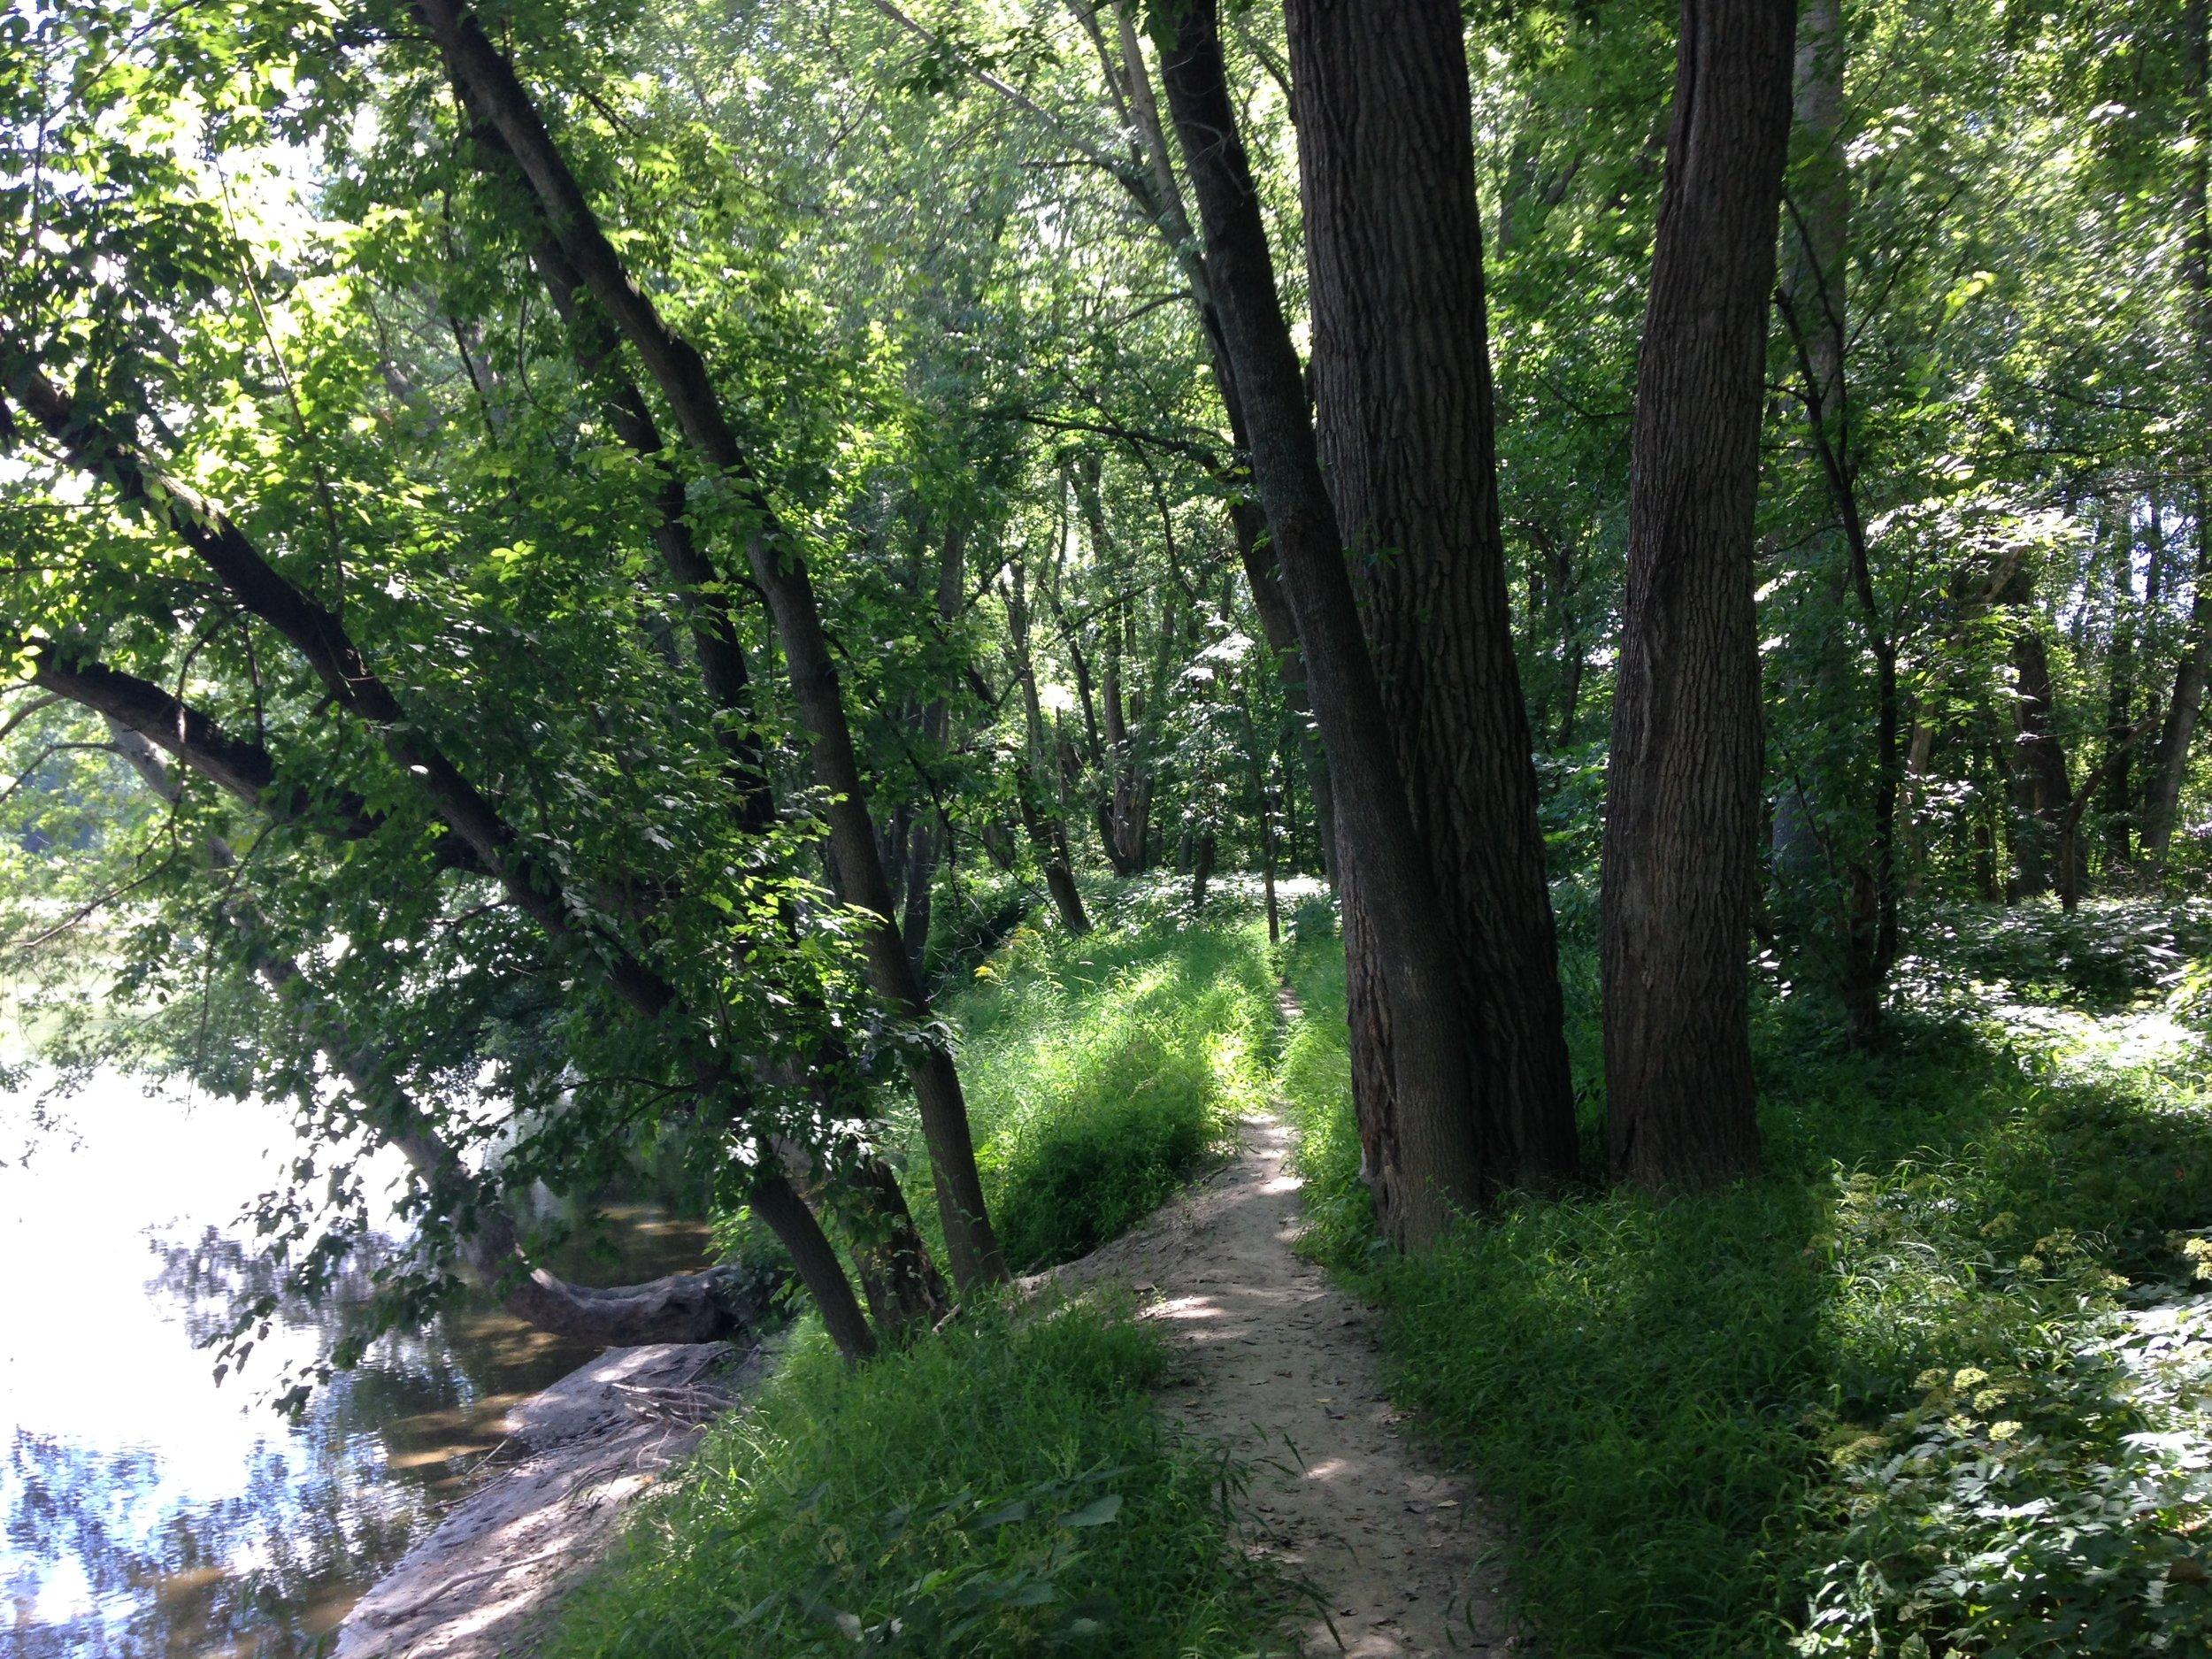 Waterway-Sidewalks-Native-Trees-and-Shrubs-1-11wq1gb.jpg